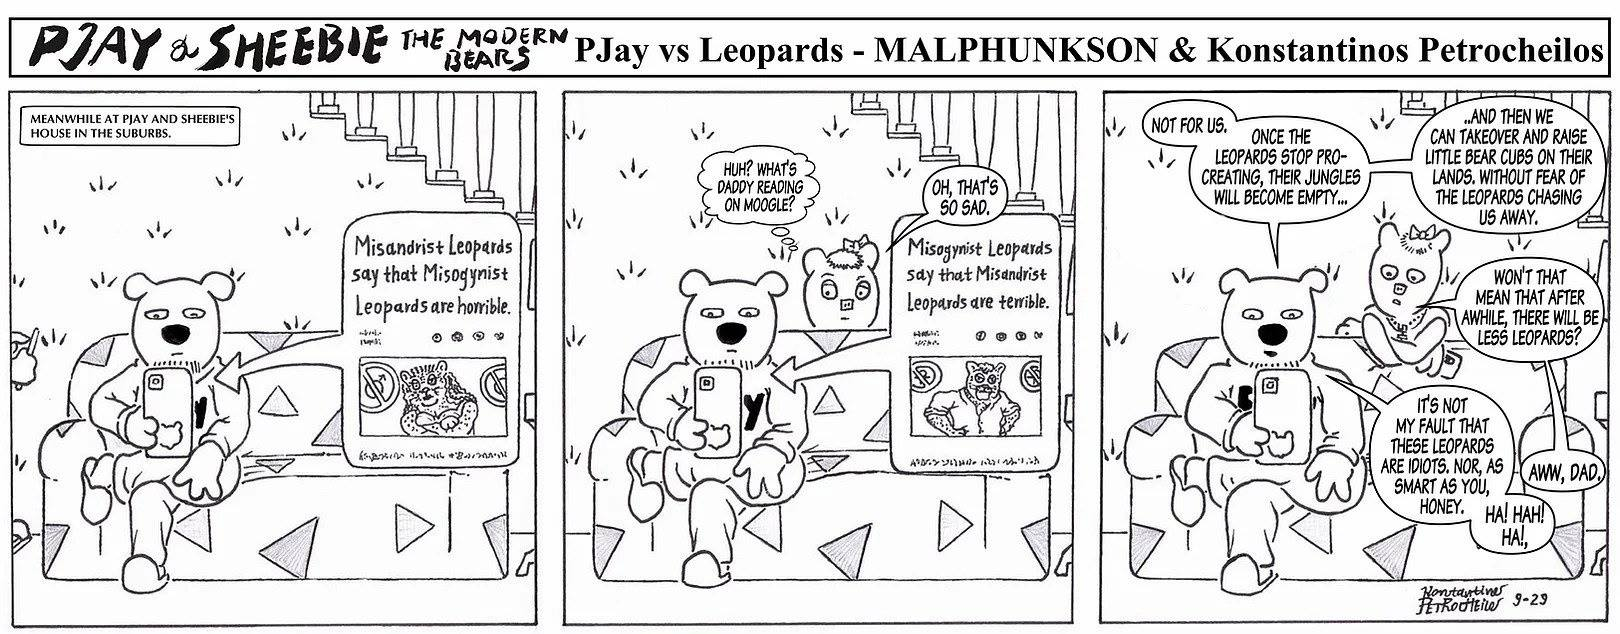 Pjay vs. Leopards